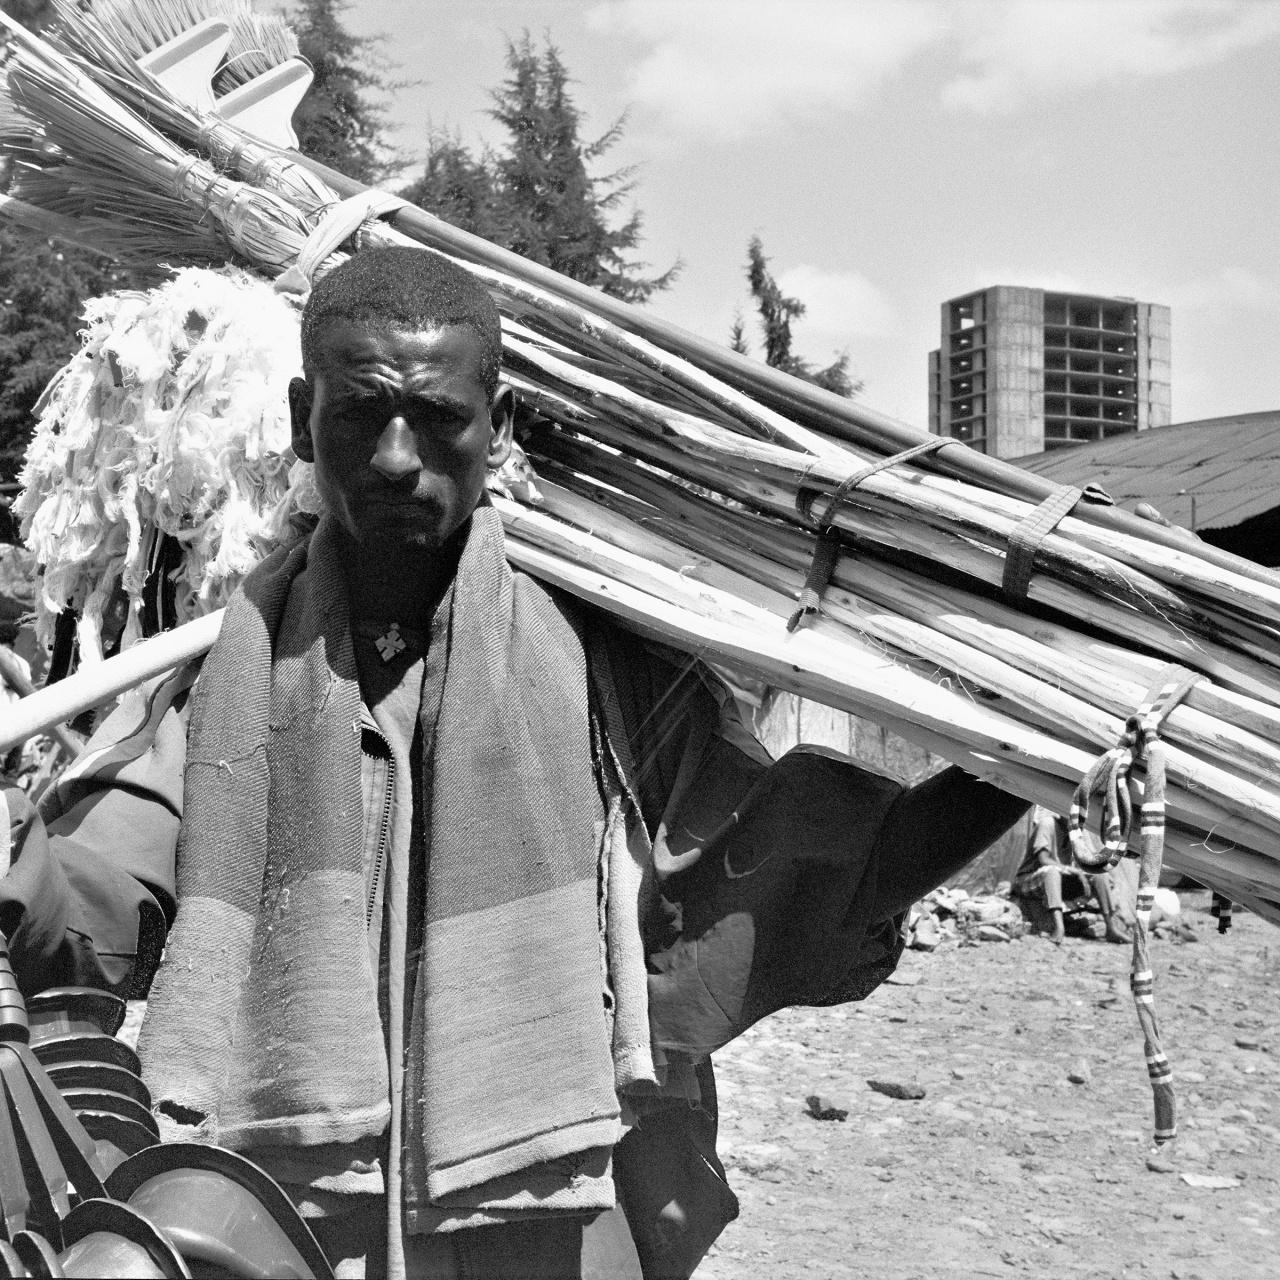 Michael Tsegaye, Future Memories XIII, 2011. Courtesy of the artist and Addis Fine Art.